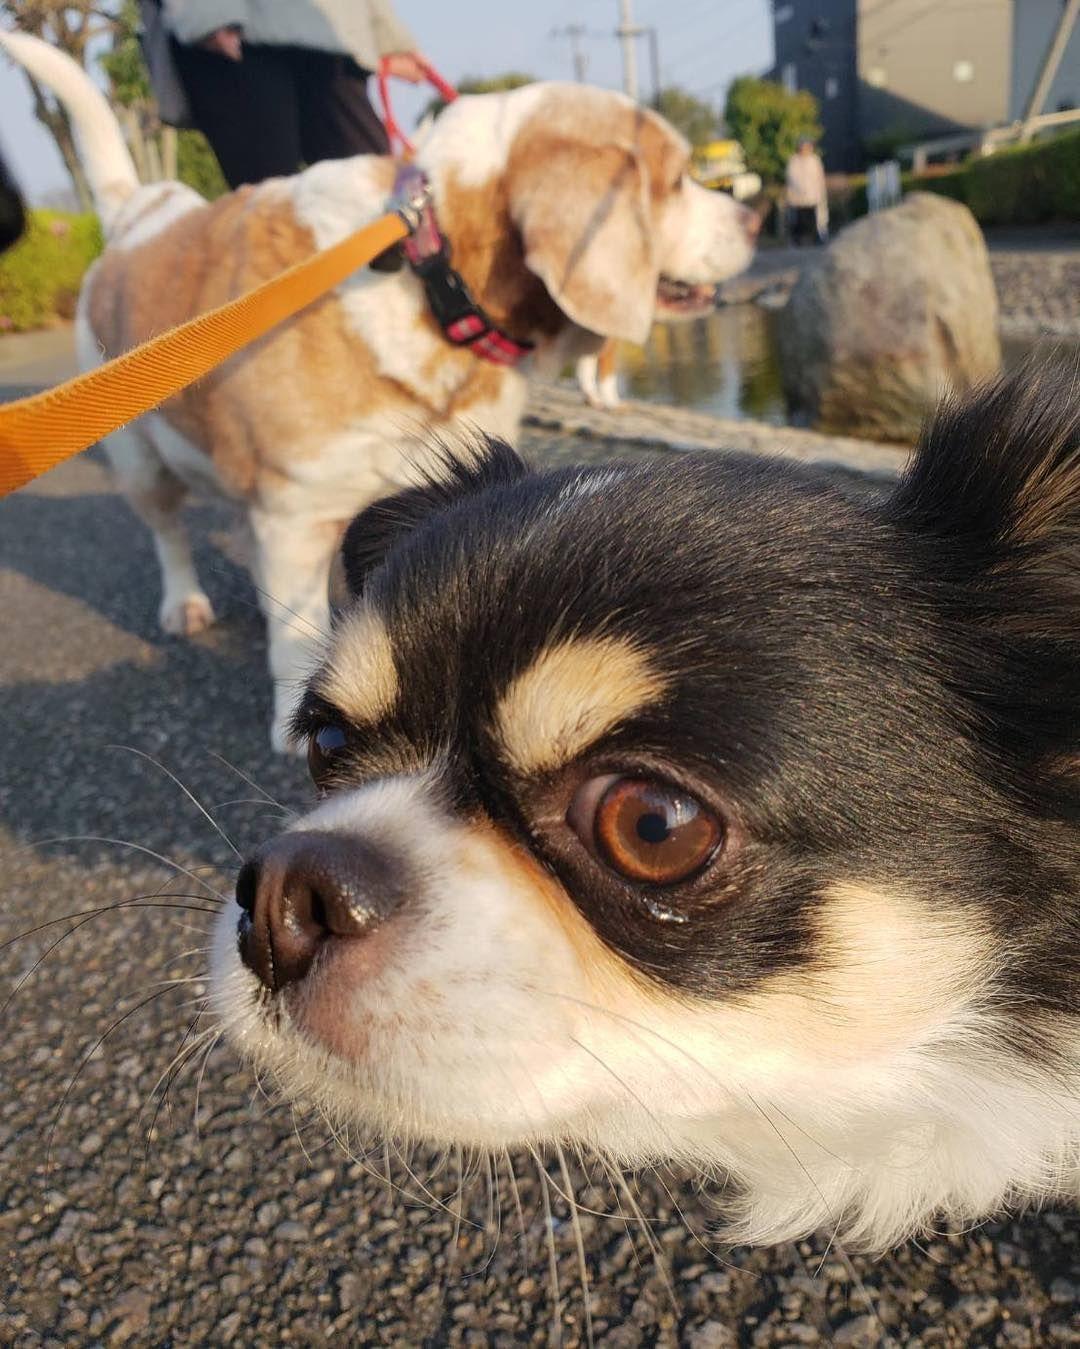 Watch The Best Youtube Videos Online 散歩中に会ったお友達です 散歩 友達 チワワ 愛犬 犬 わんこ 動物 ペット 家族 後田川緑道公園 宮崎 九州 日本 Walk Walking Chihuahua Beagle Lemonbeagle Dog Animals Dogs